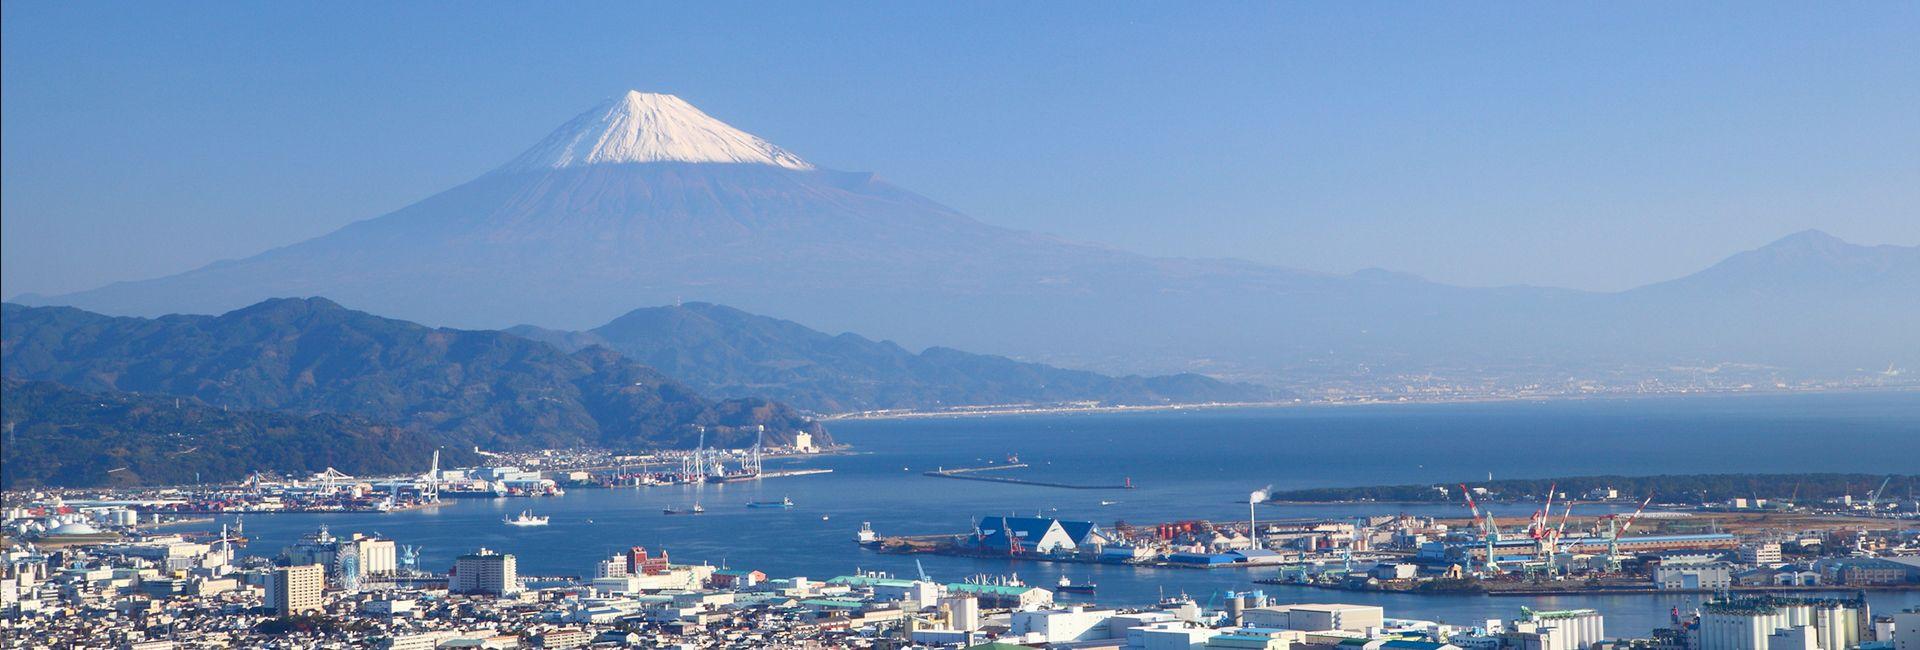 port de Shizuoka et le mont Fuji